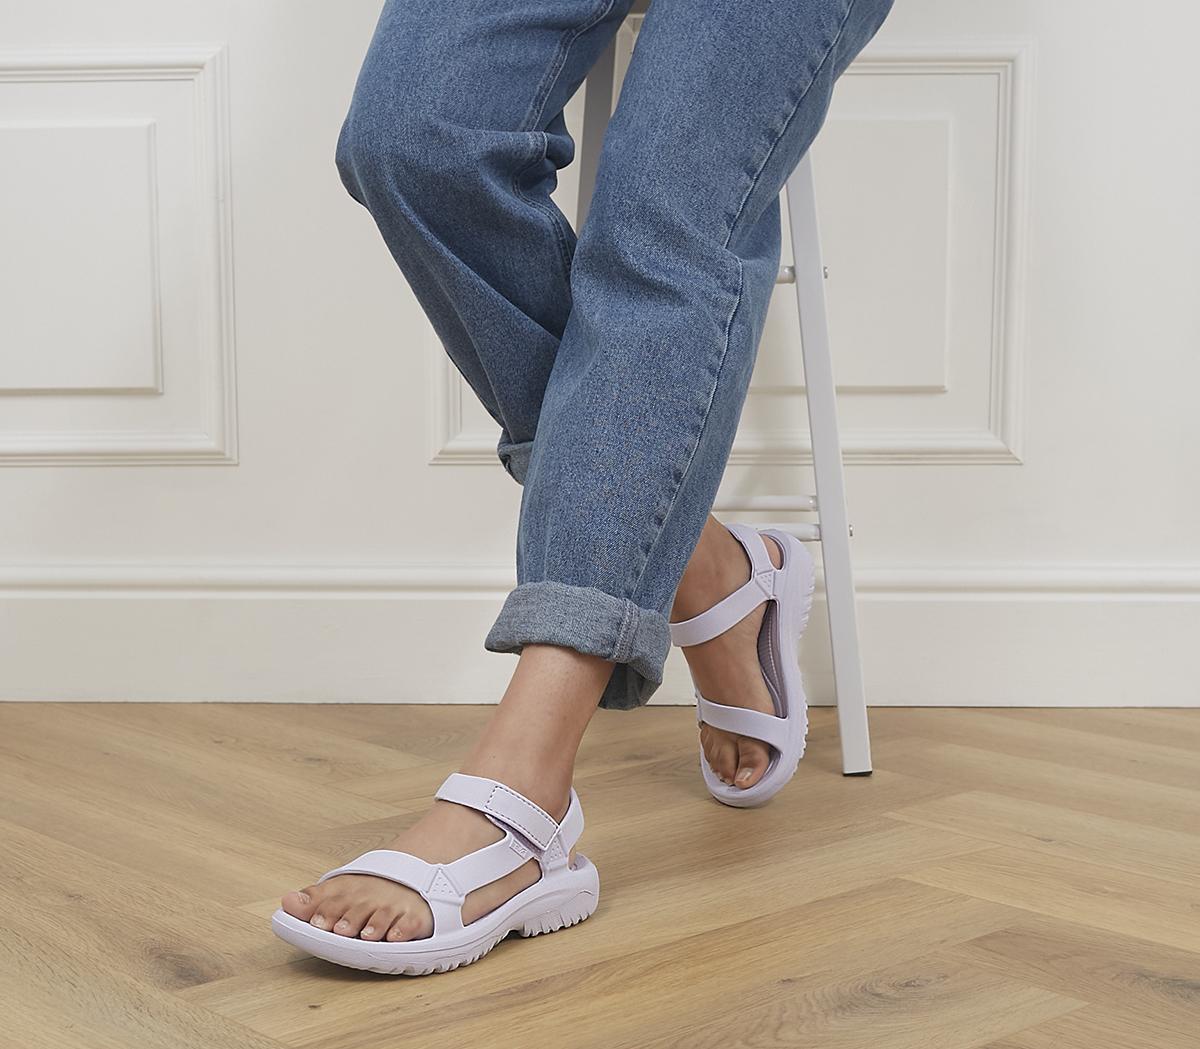 Hurricane Drift Sandals